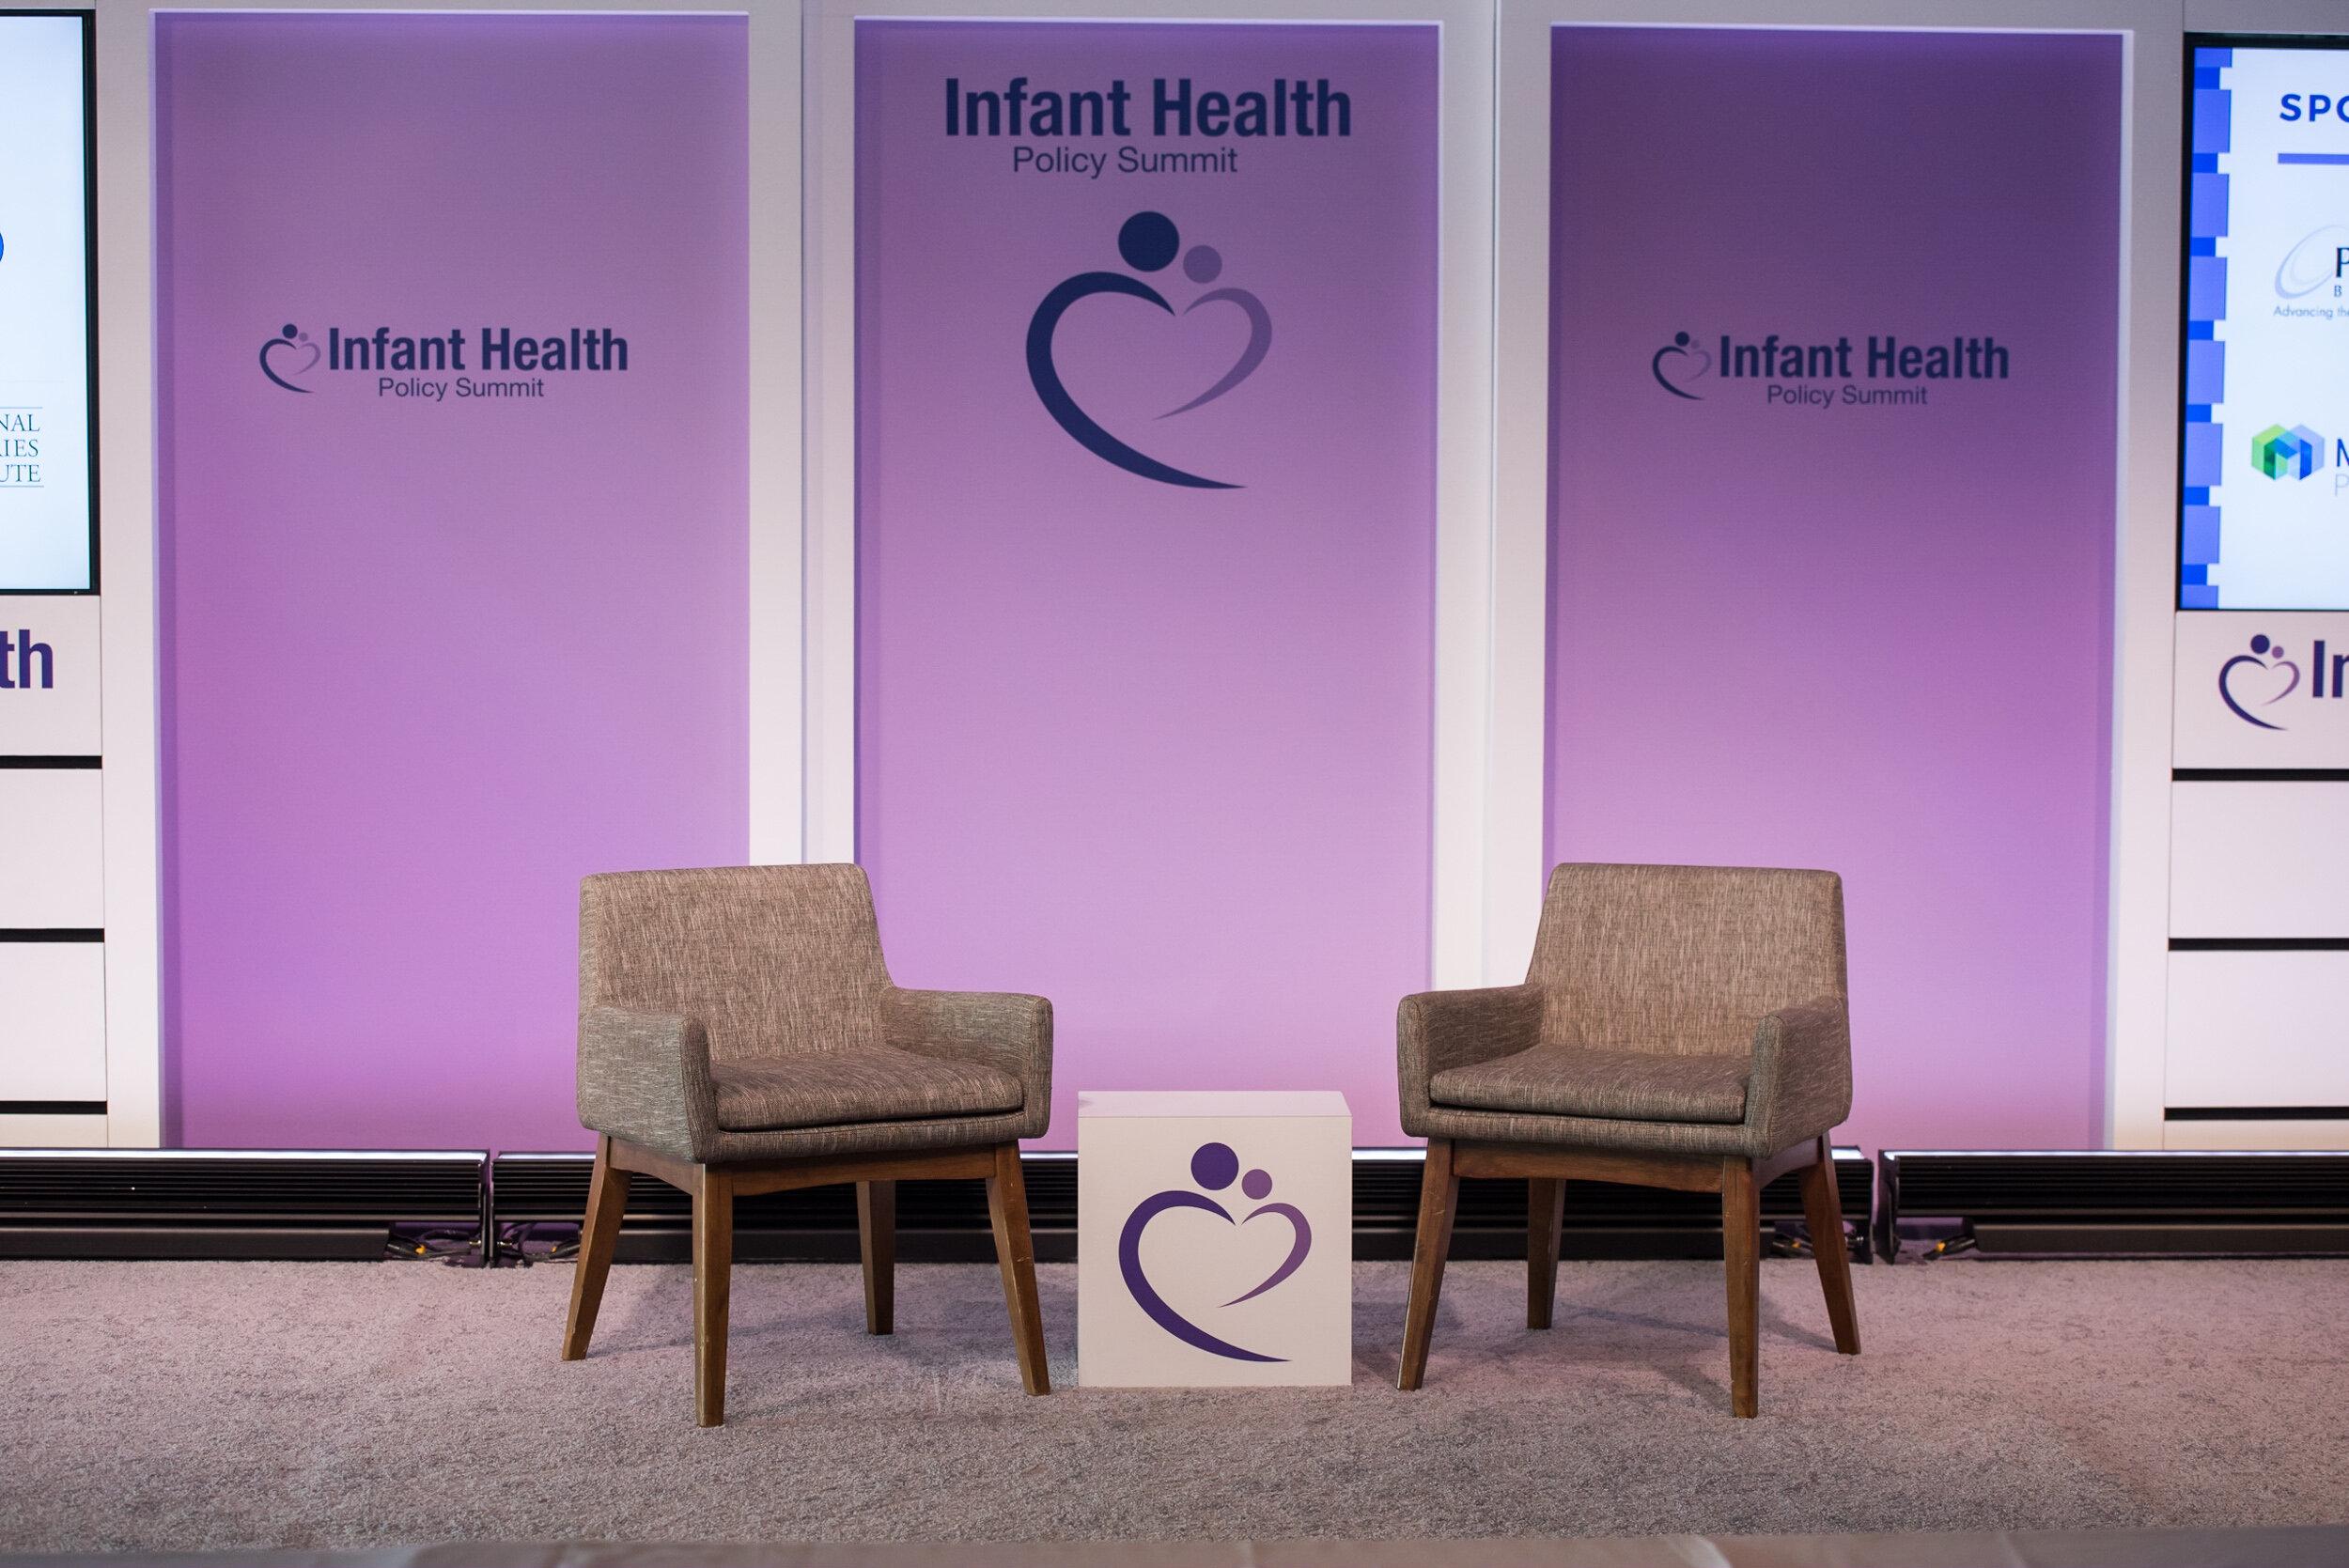 AfPA Infant Health Summit - Jason Dixson Photography - 190912 - 080920 - 0204.jpg